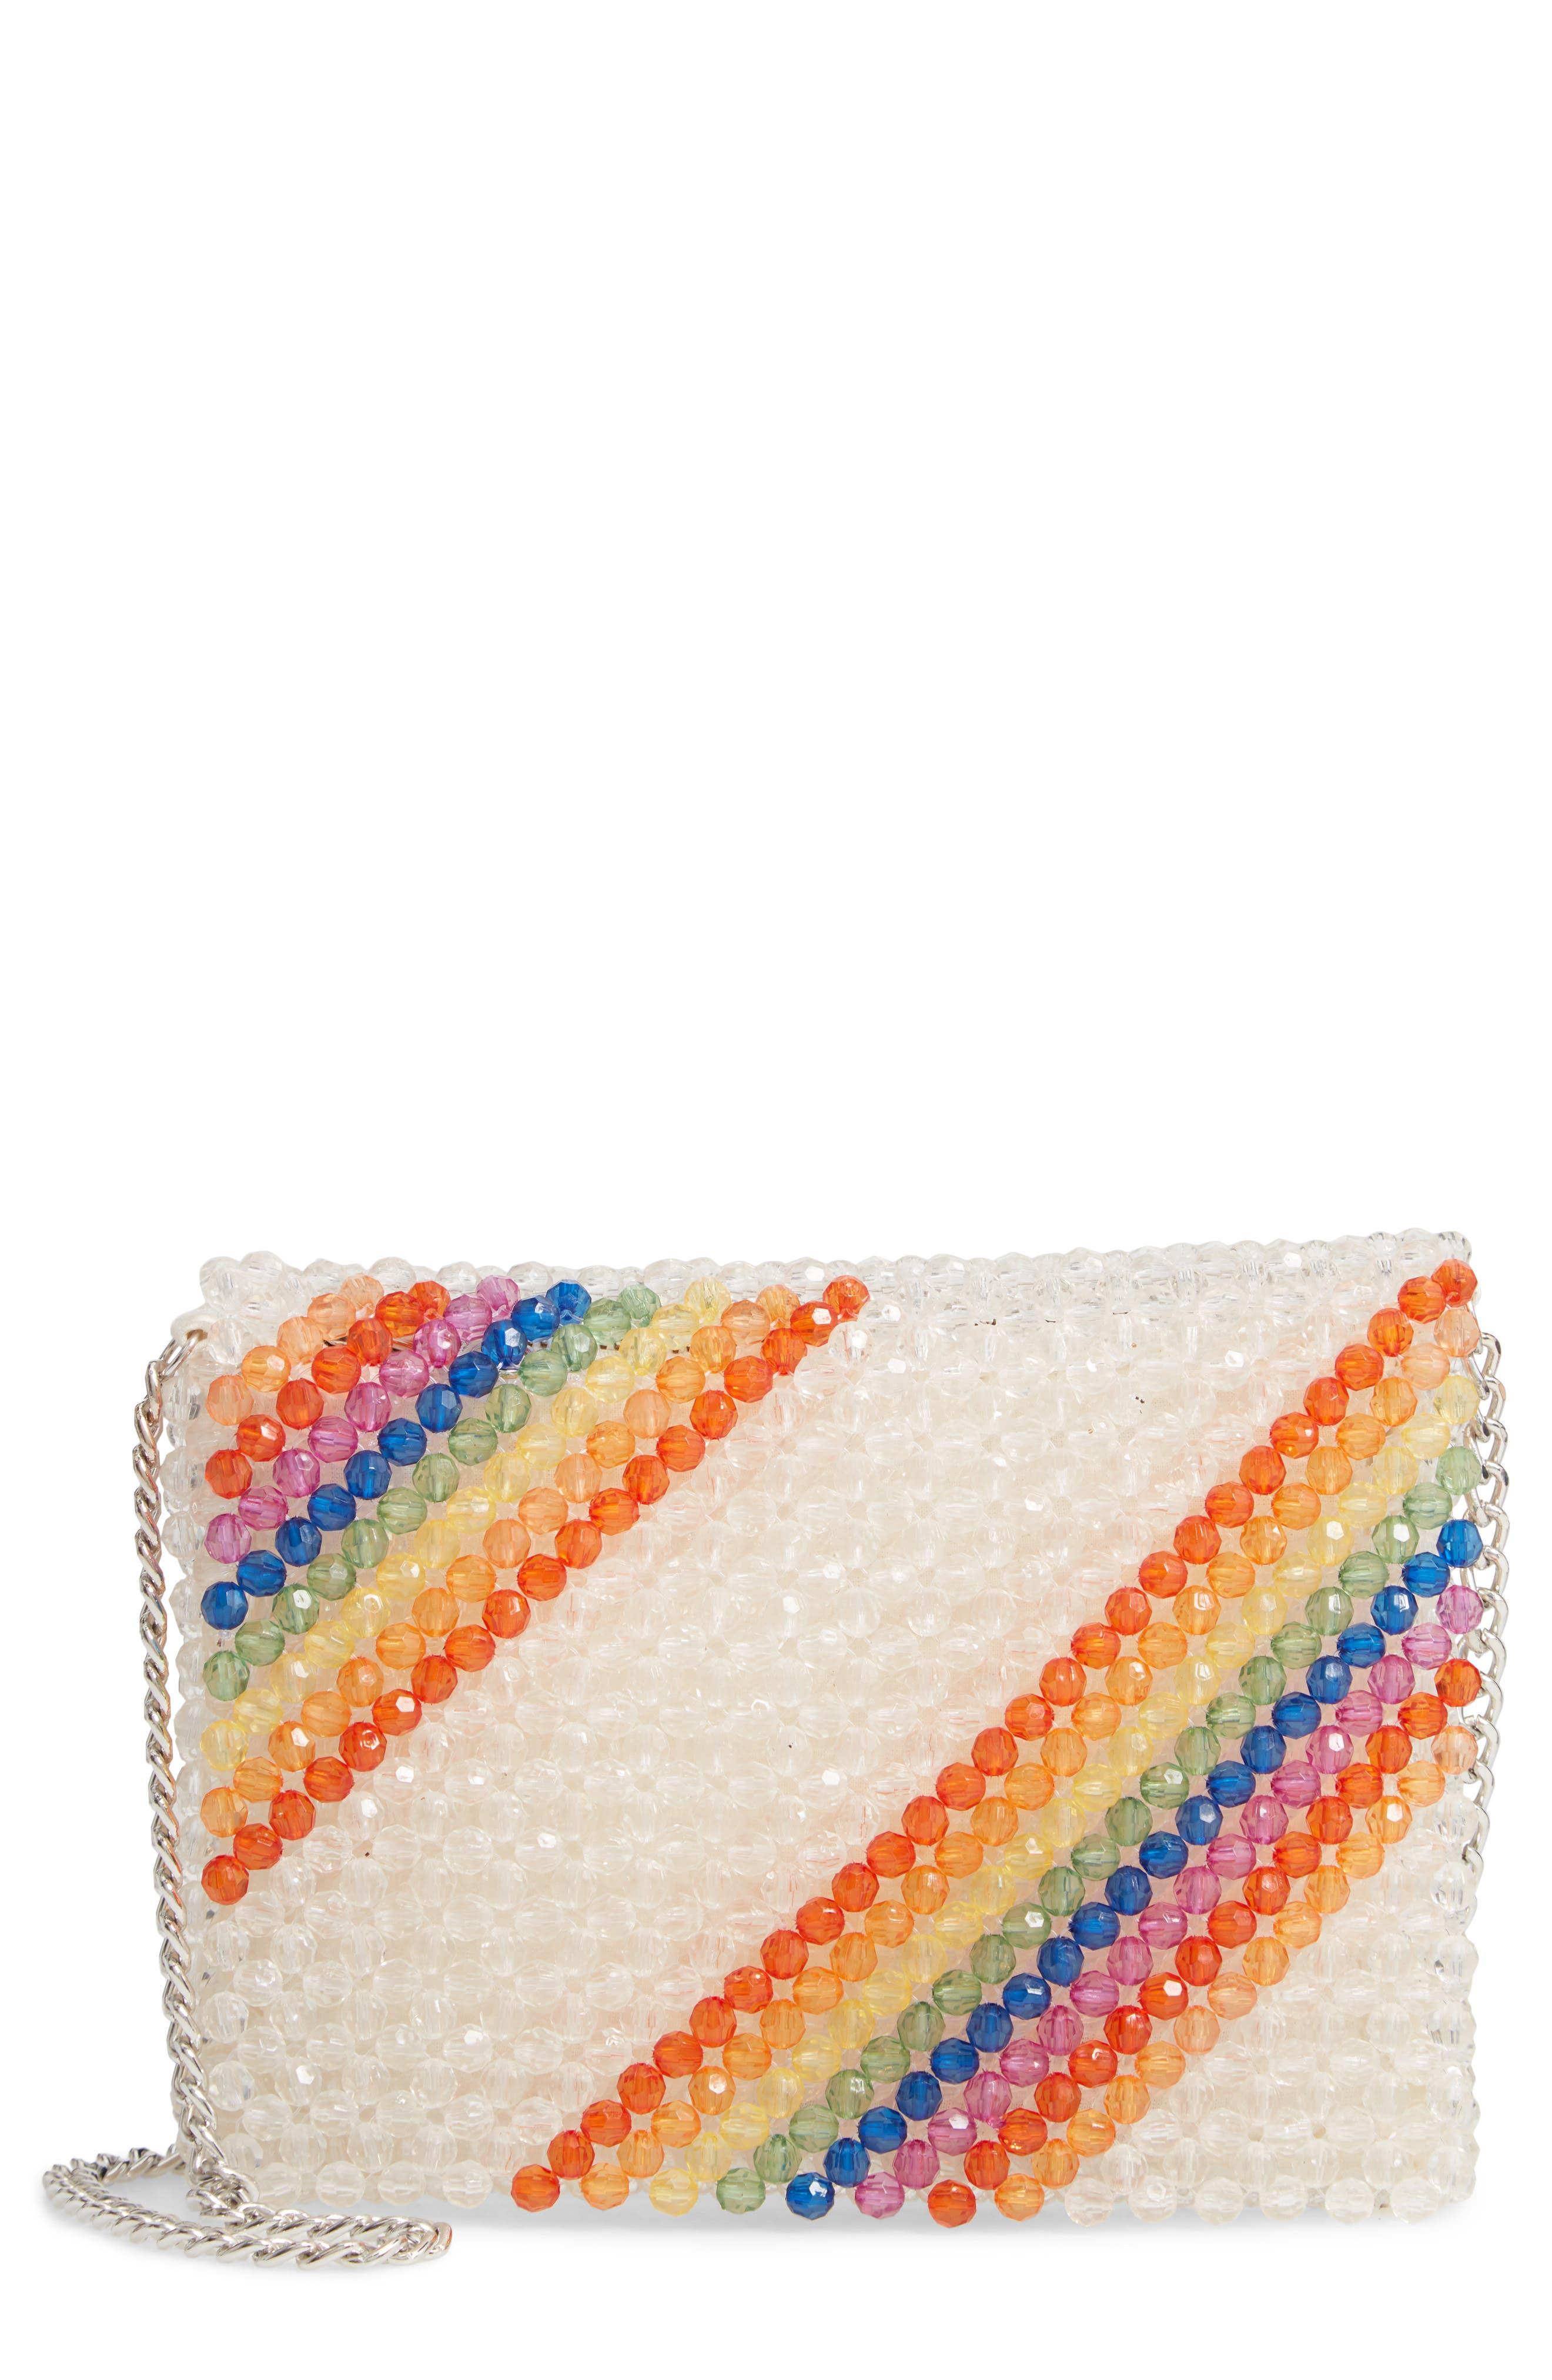 Zizi Beaded Rainbow Shoulder Bag,                             Main thumbnail 1, color,                             100